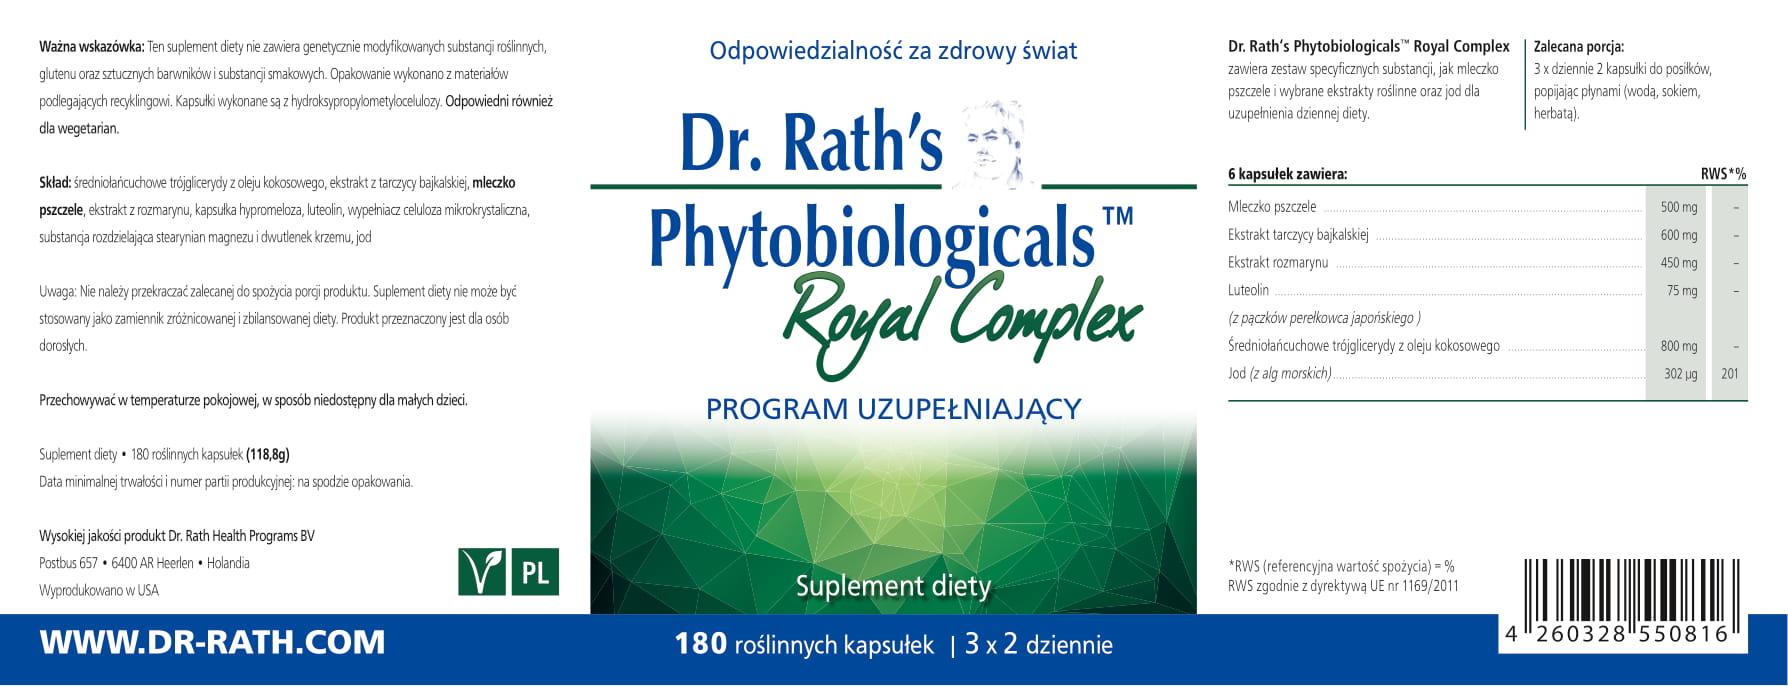 035_PL_-_Royal_Complex_-_Etykieta_produktu-1.jpg